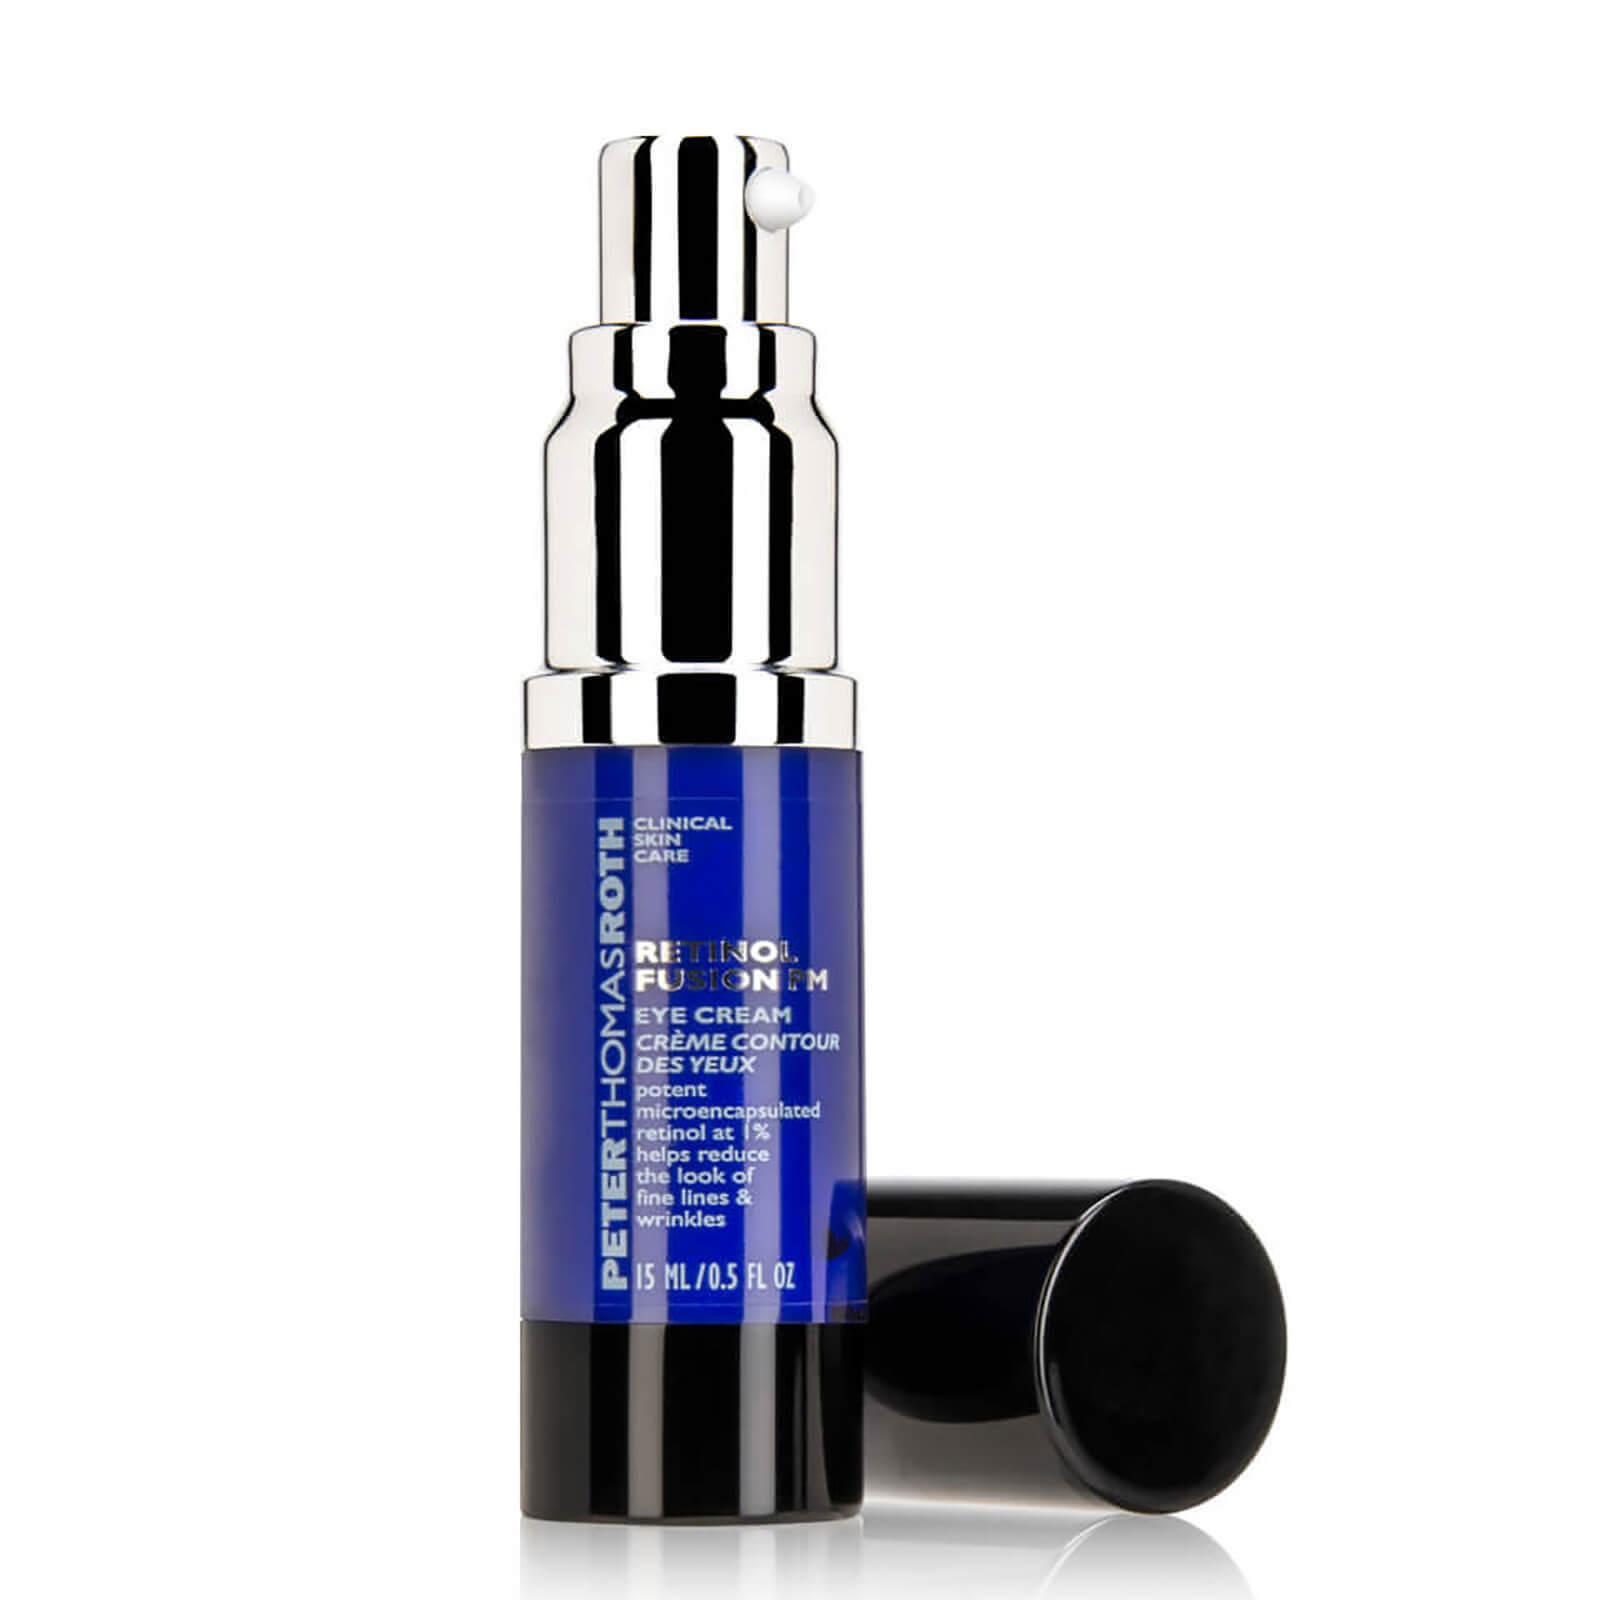 Купить Peter Thomas Roth Retinol Fusion PM Eye Cream